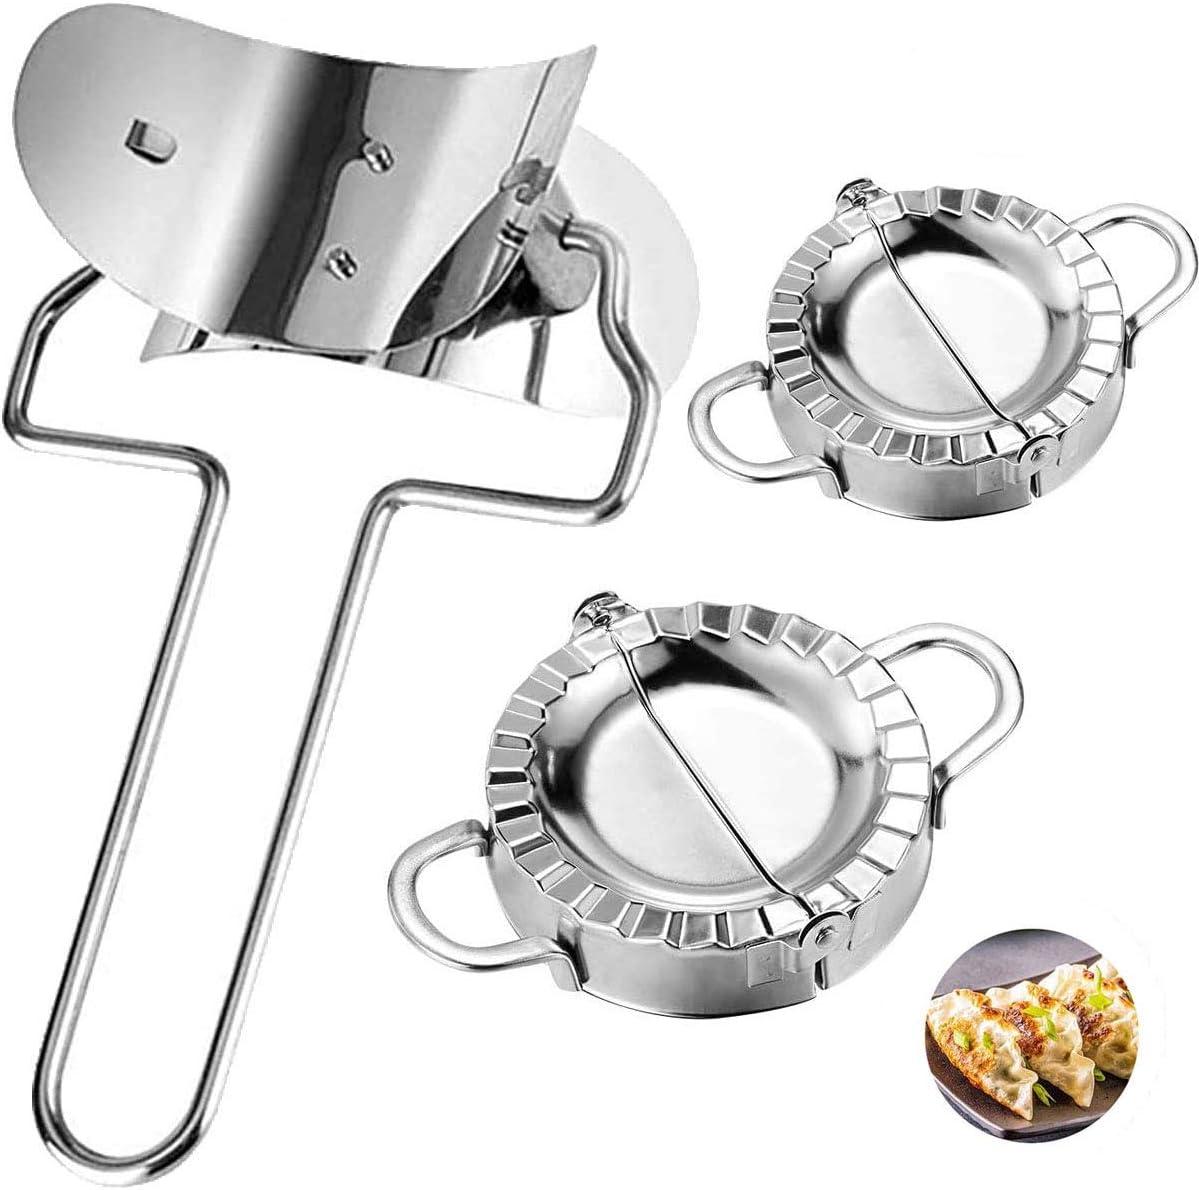 Dumplings Max 64% OFF Maker-3 Pack Stainless Steel Dumpling Over item handling ☆ Mold Dumplin Set